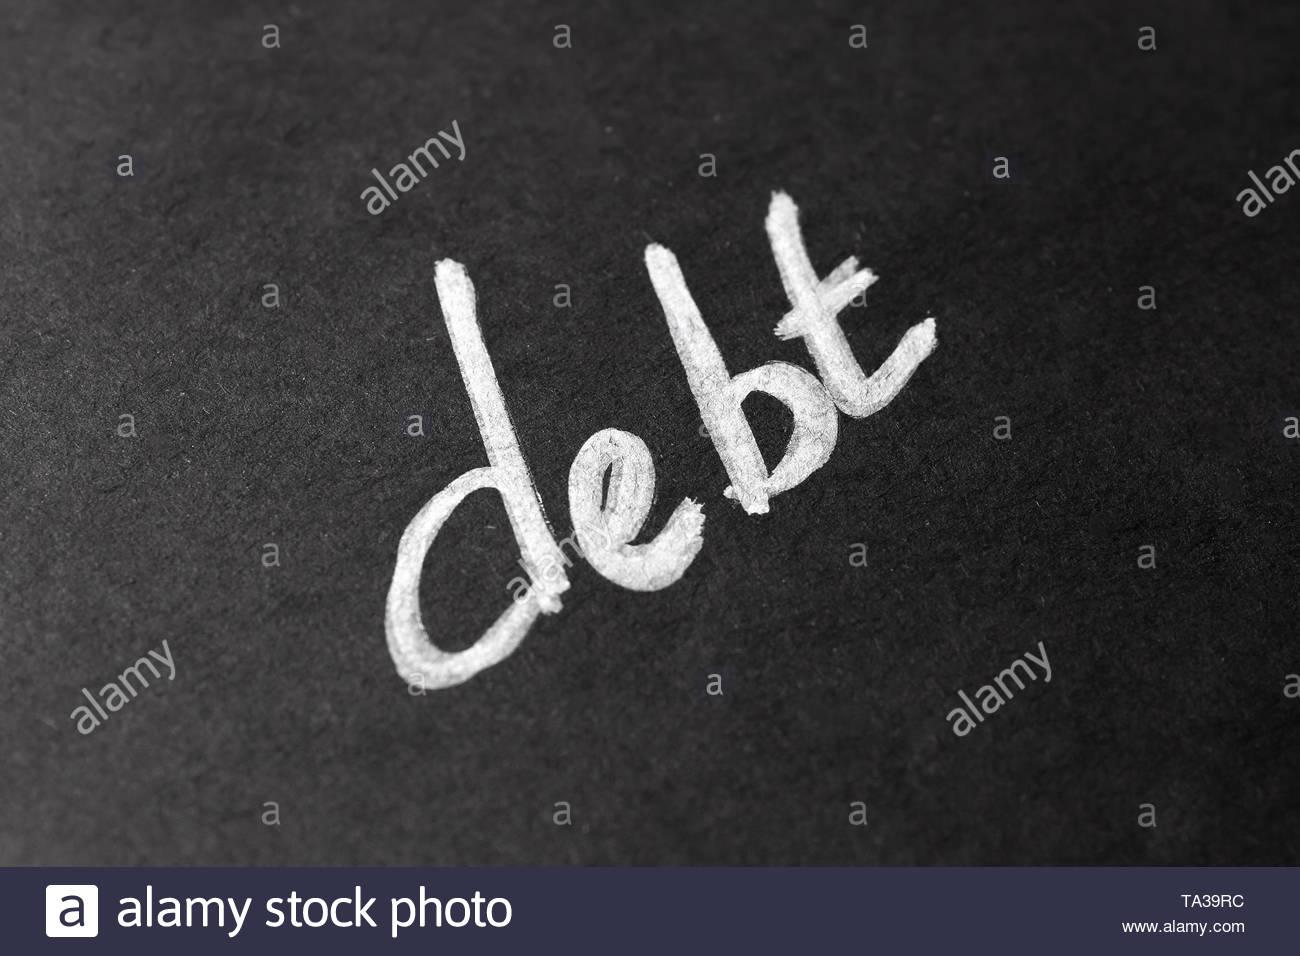 Word DEBT on dark background Stock Photo 247165280   Alamy 1300x956